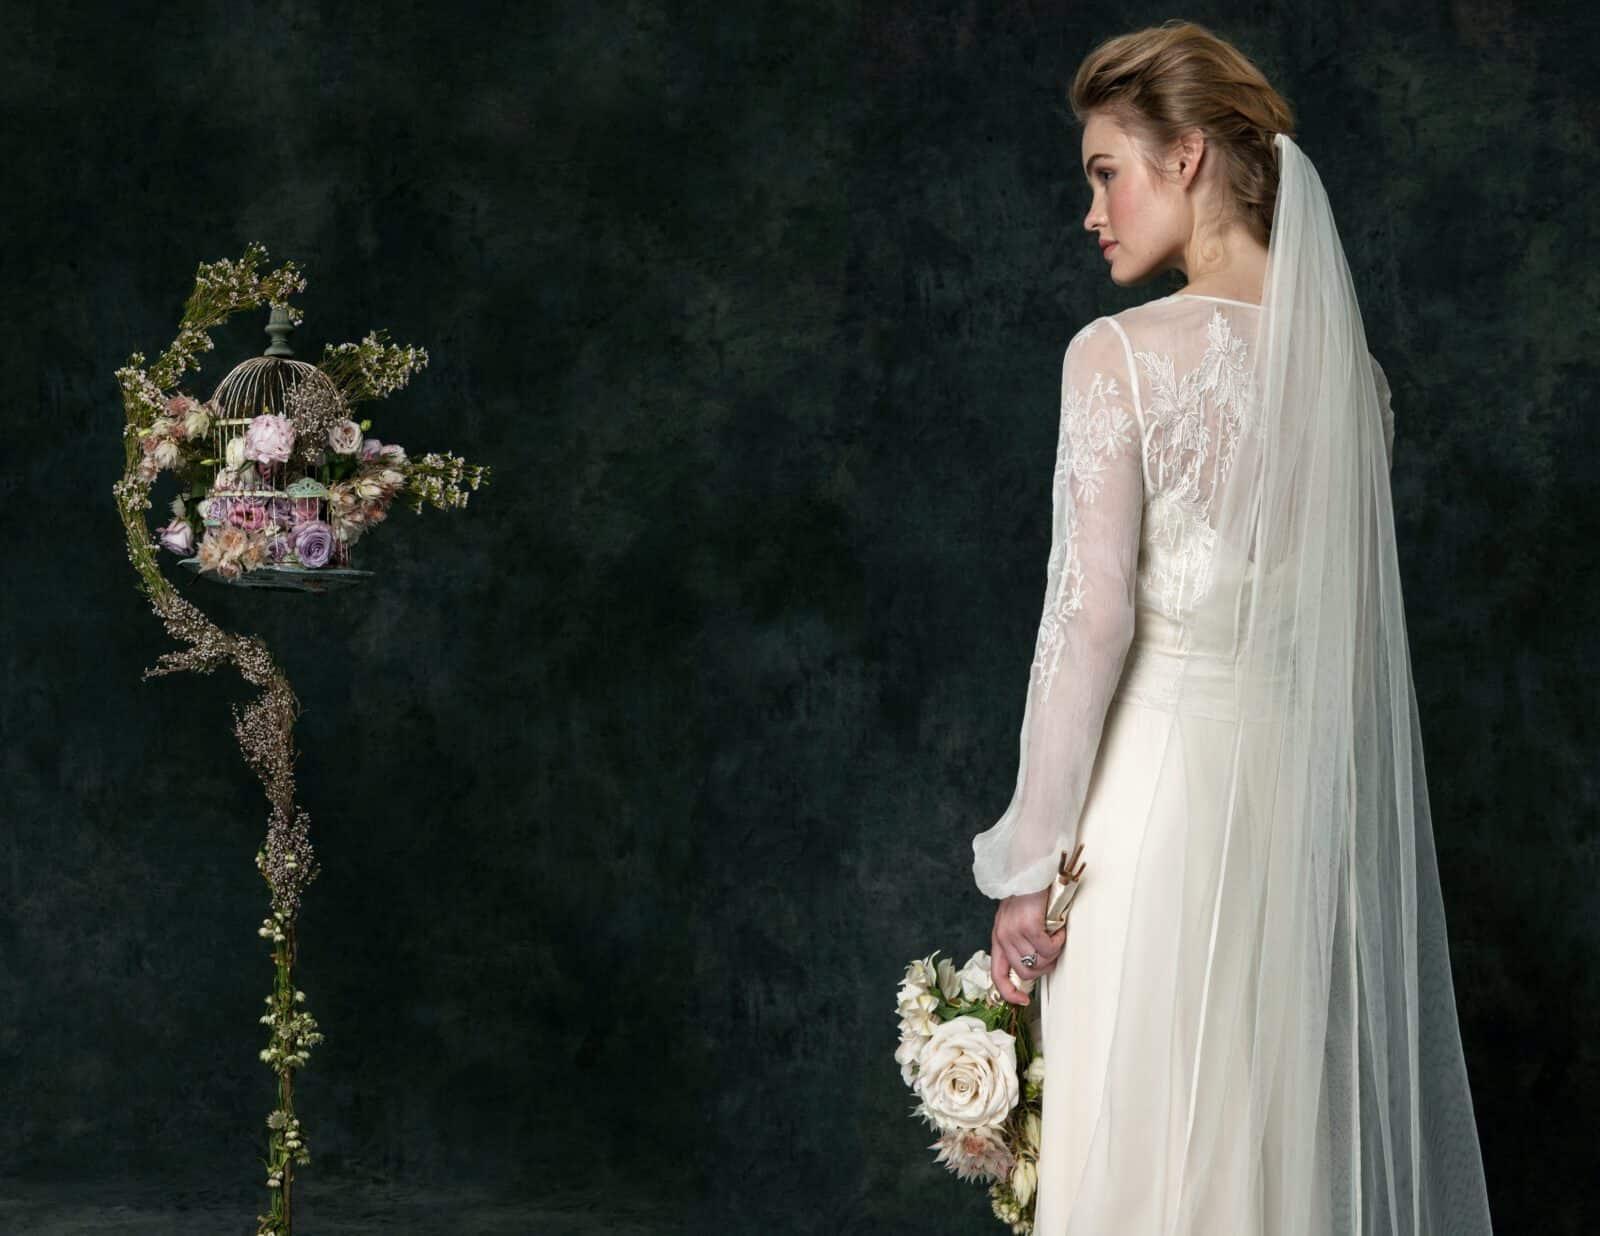 SAJA Wedding Brautkleider Kollektion 2016